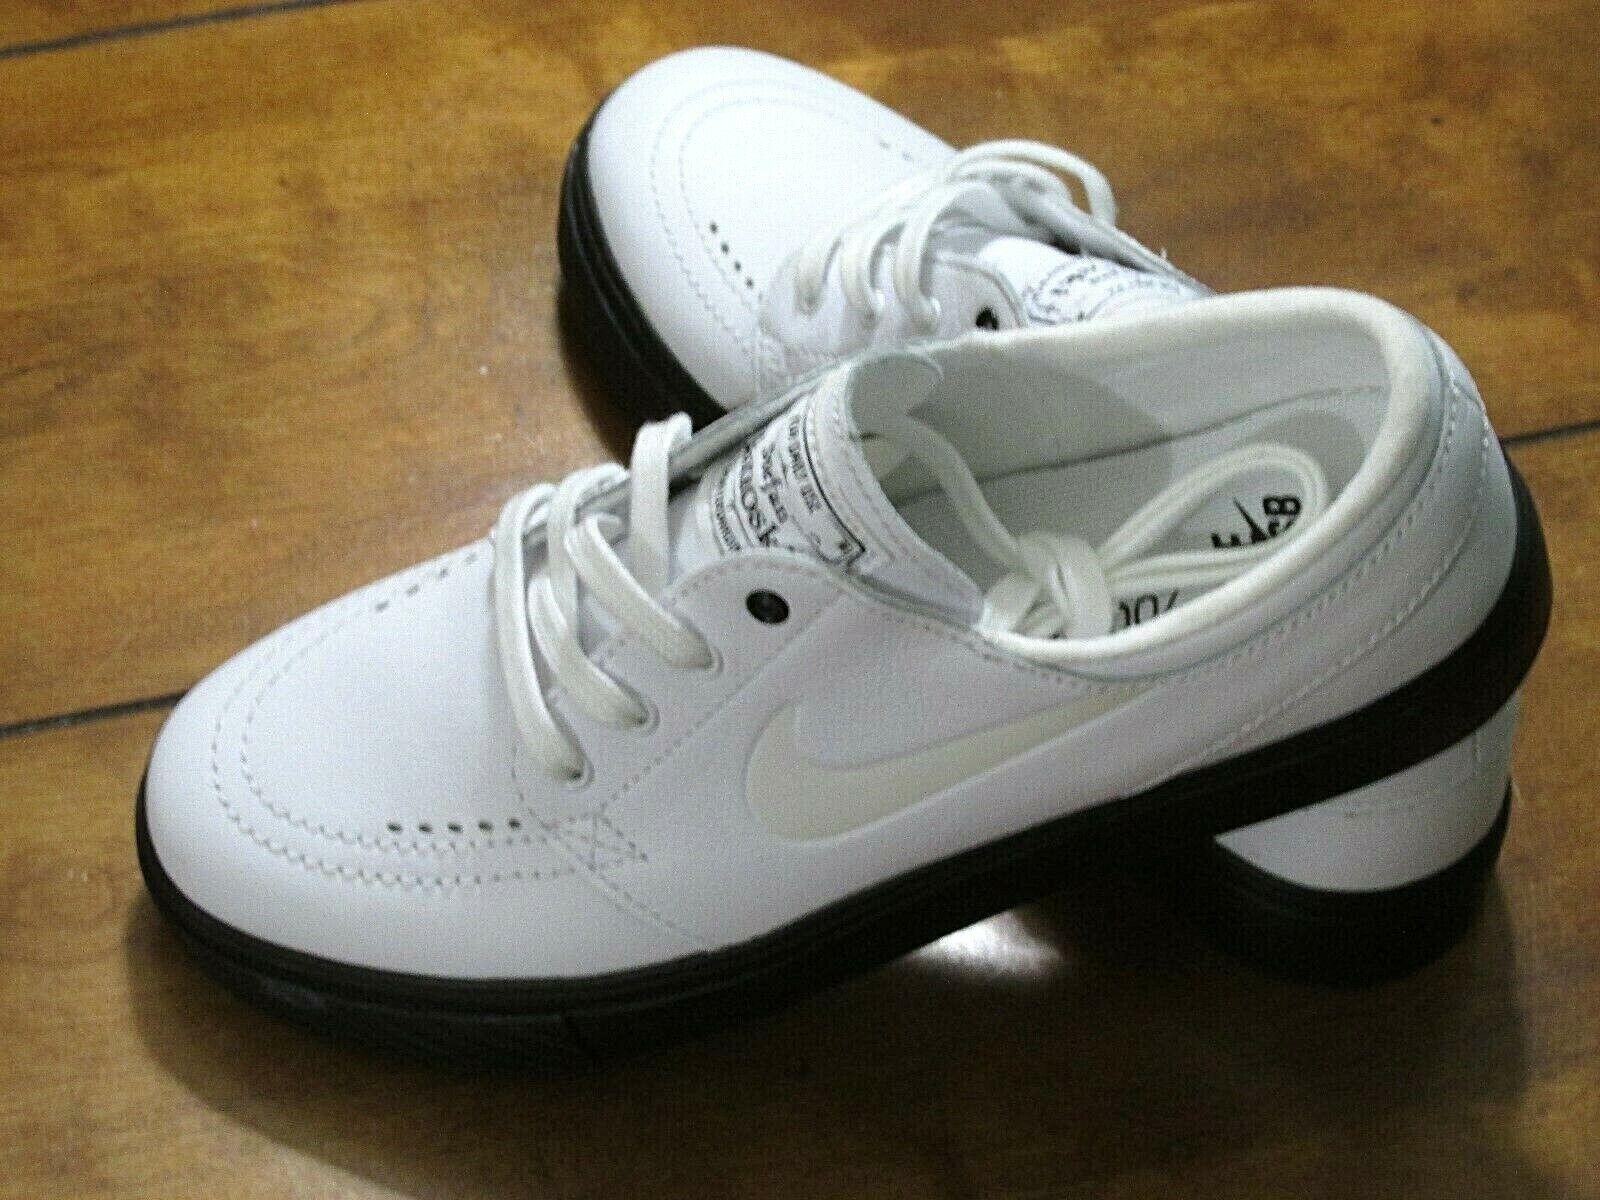 Unisex Nike SB Zoom Stefan Janoski SB Premium White Leather Size Men's(6)Wn(7.5)